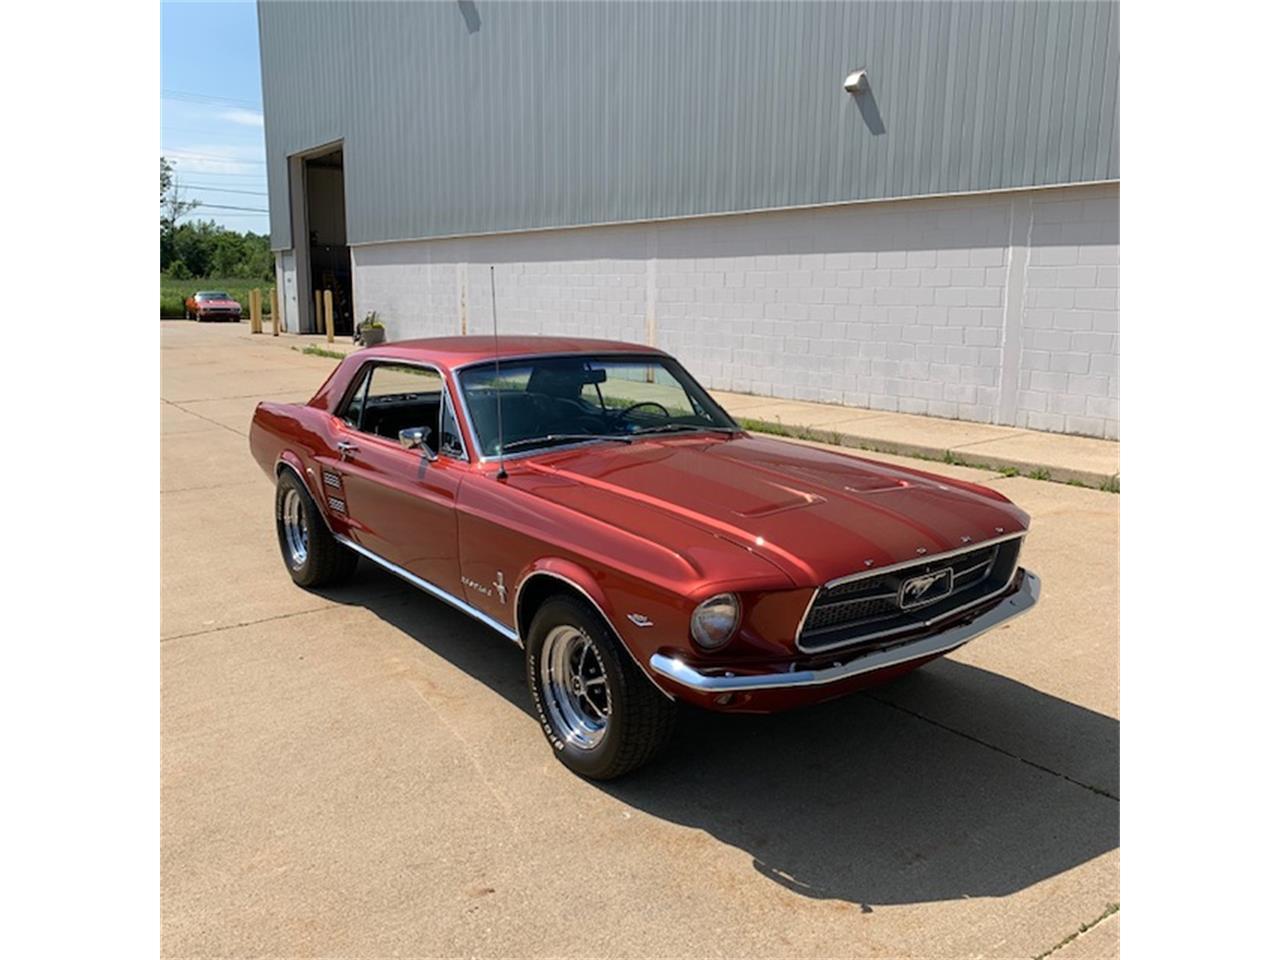 Ford Mustang 302 v8 1967 prix tout compris 1967